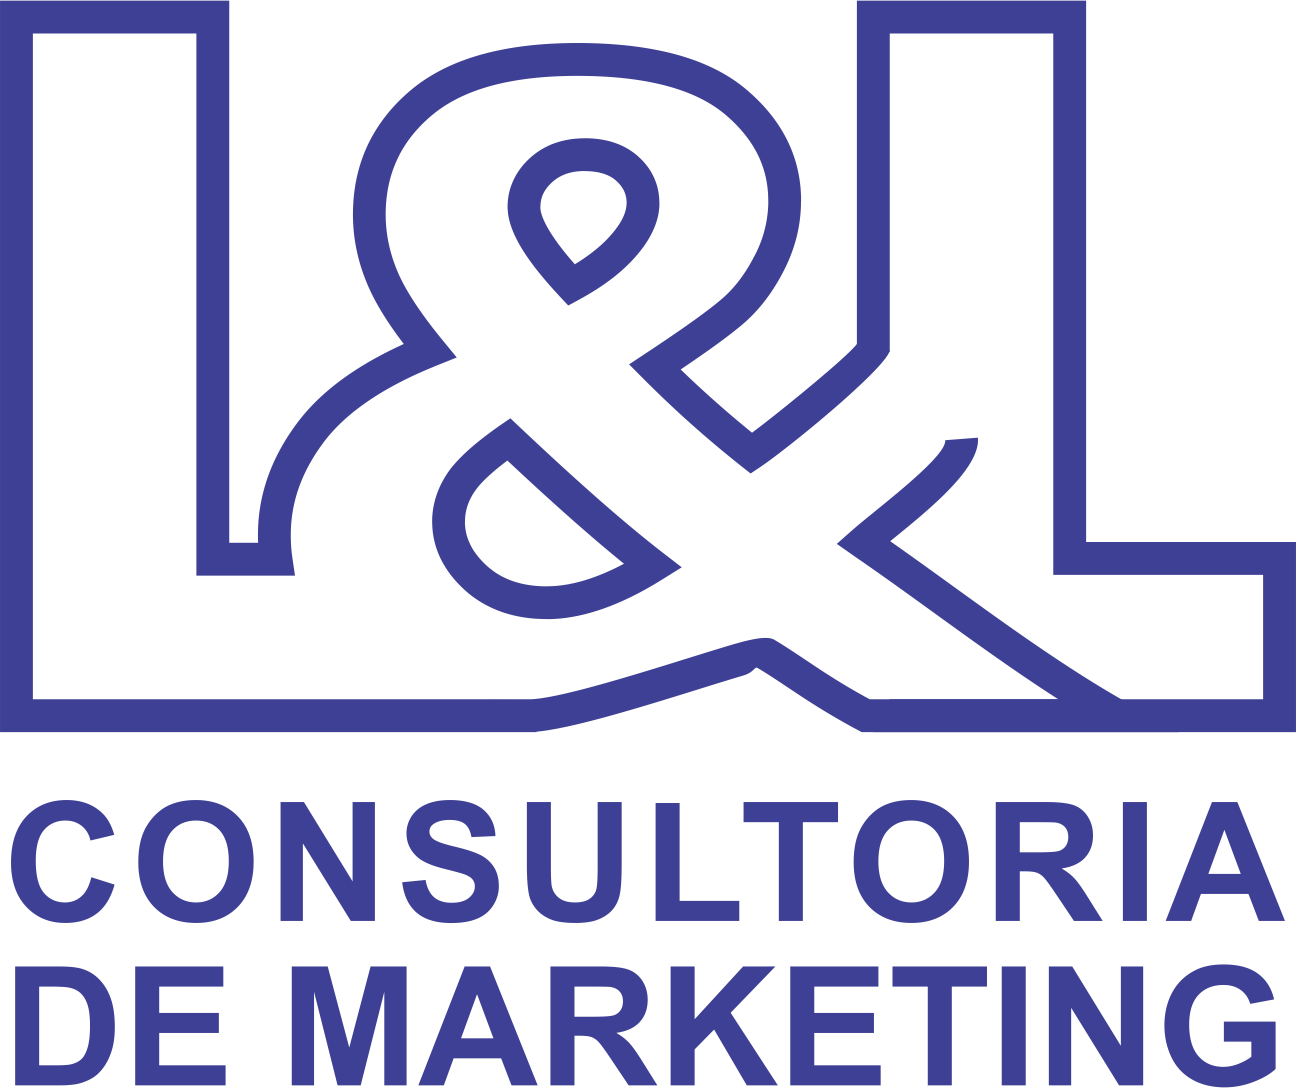 L&L Consultoria de Marketing